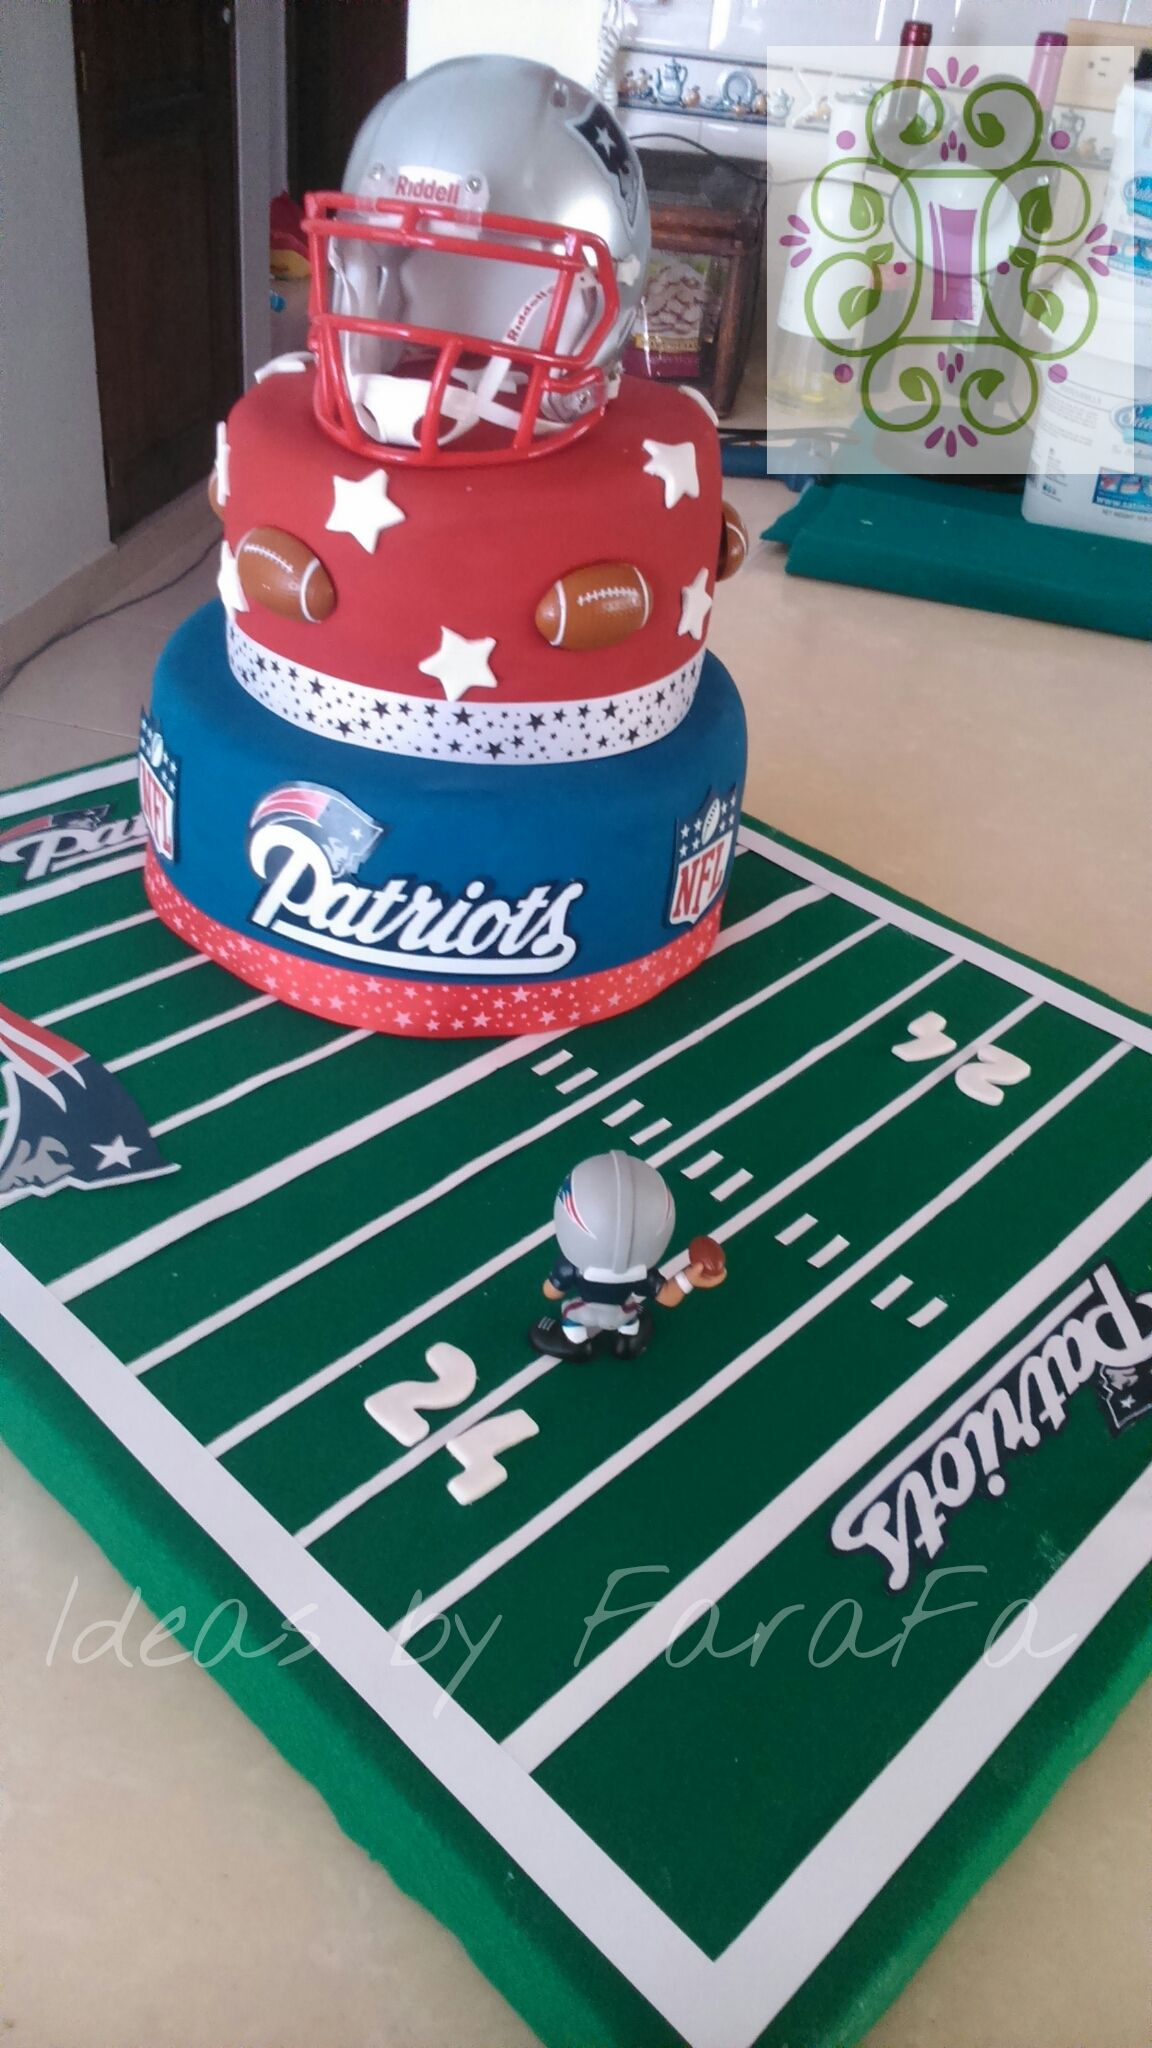 New England Patriots Cake Ver En Ideas By Farafa En Facebook Patriotic Cake Football Birthday Party Football Cake